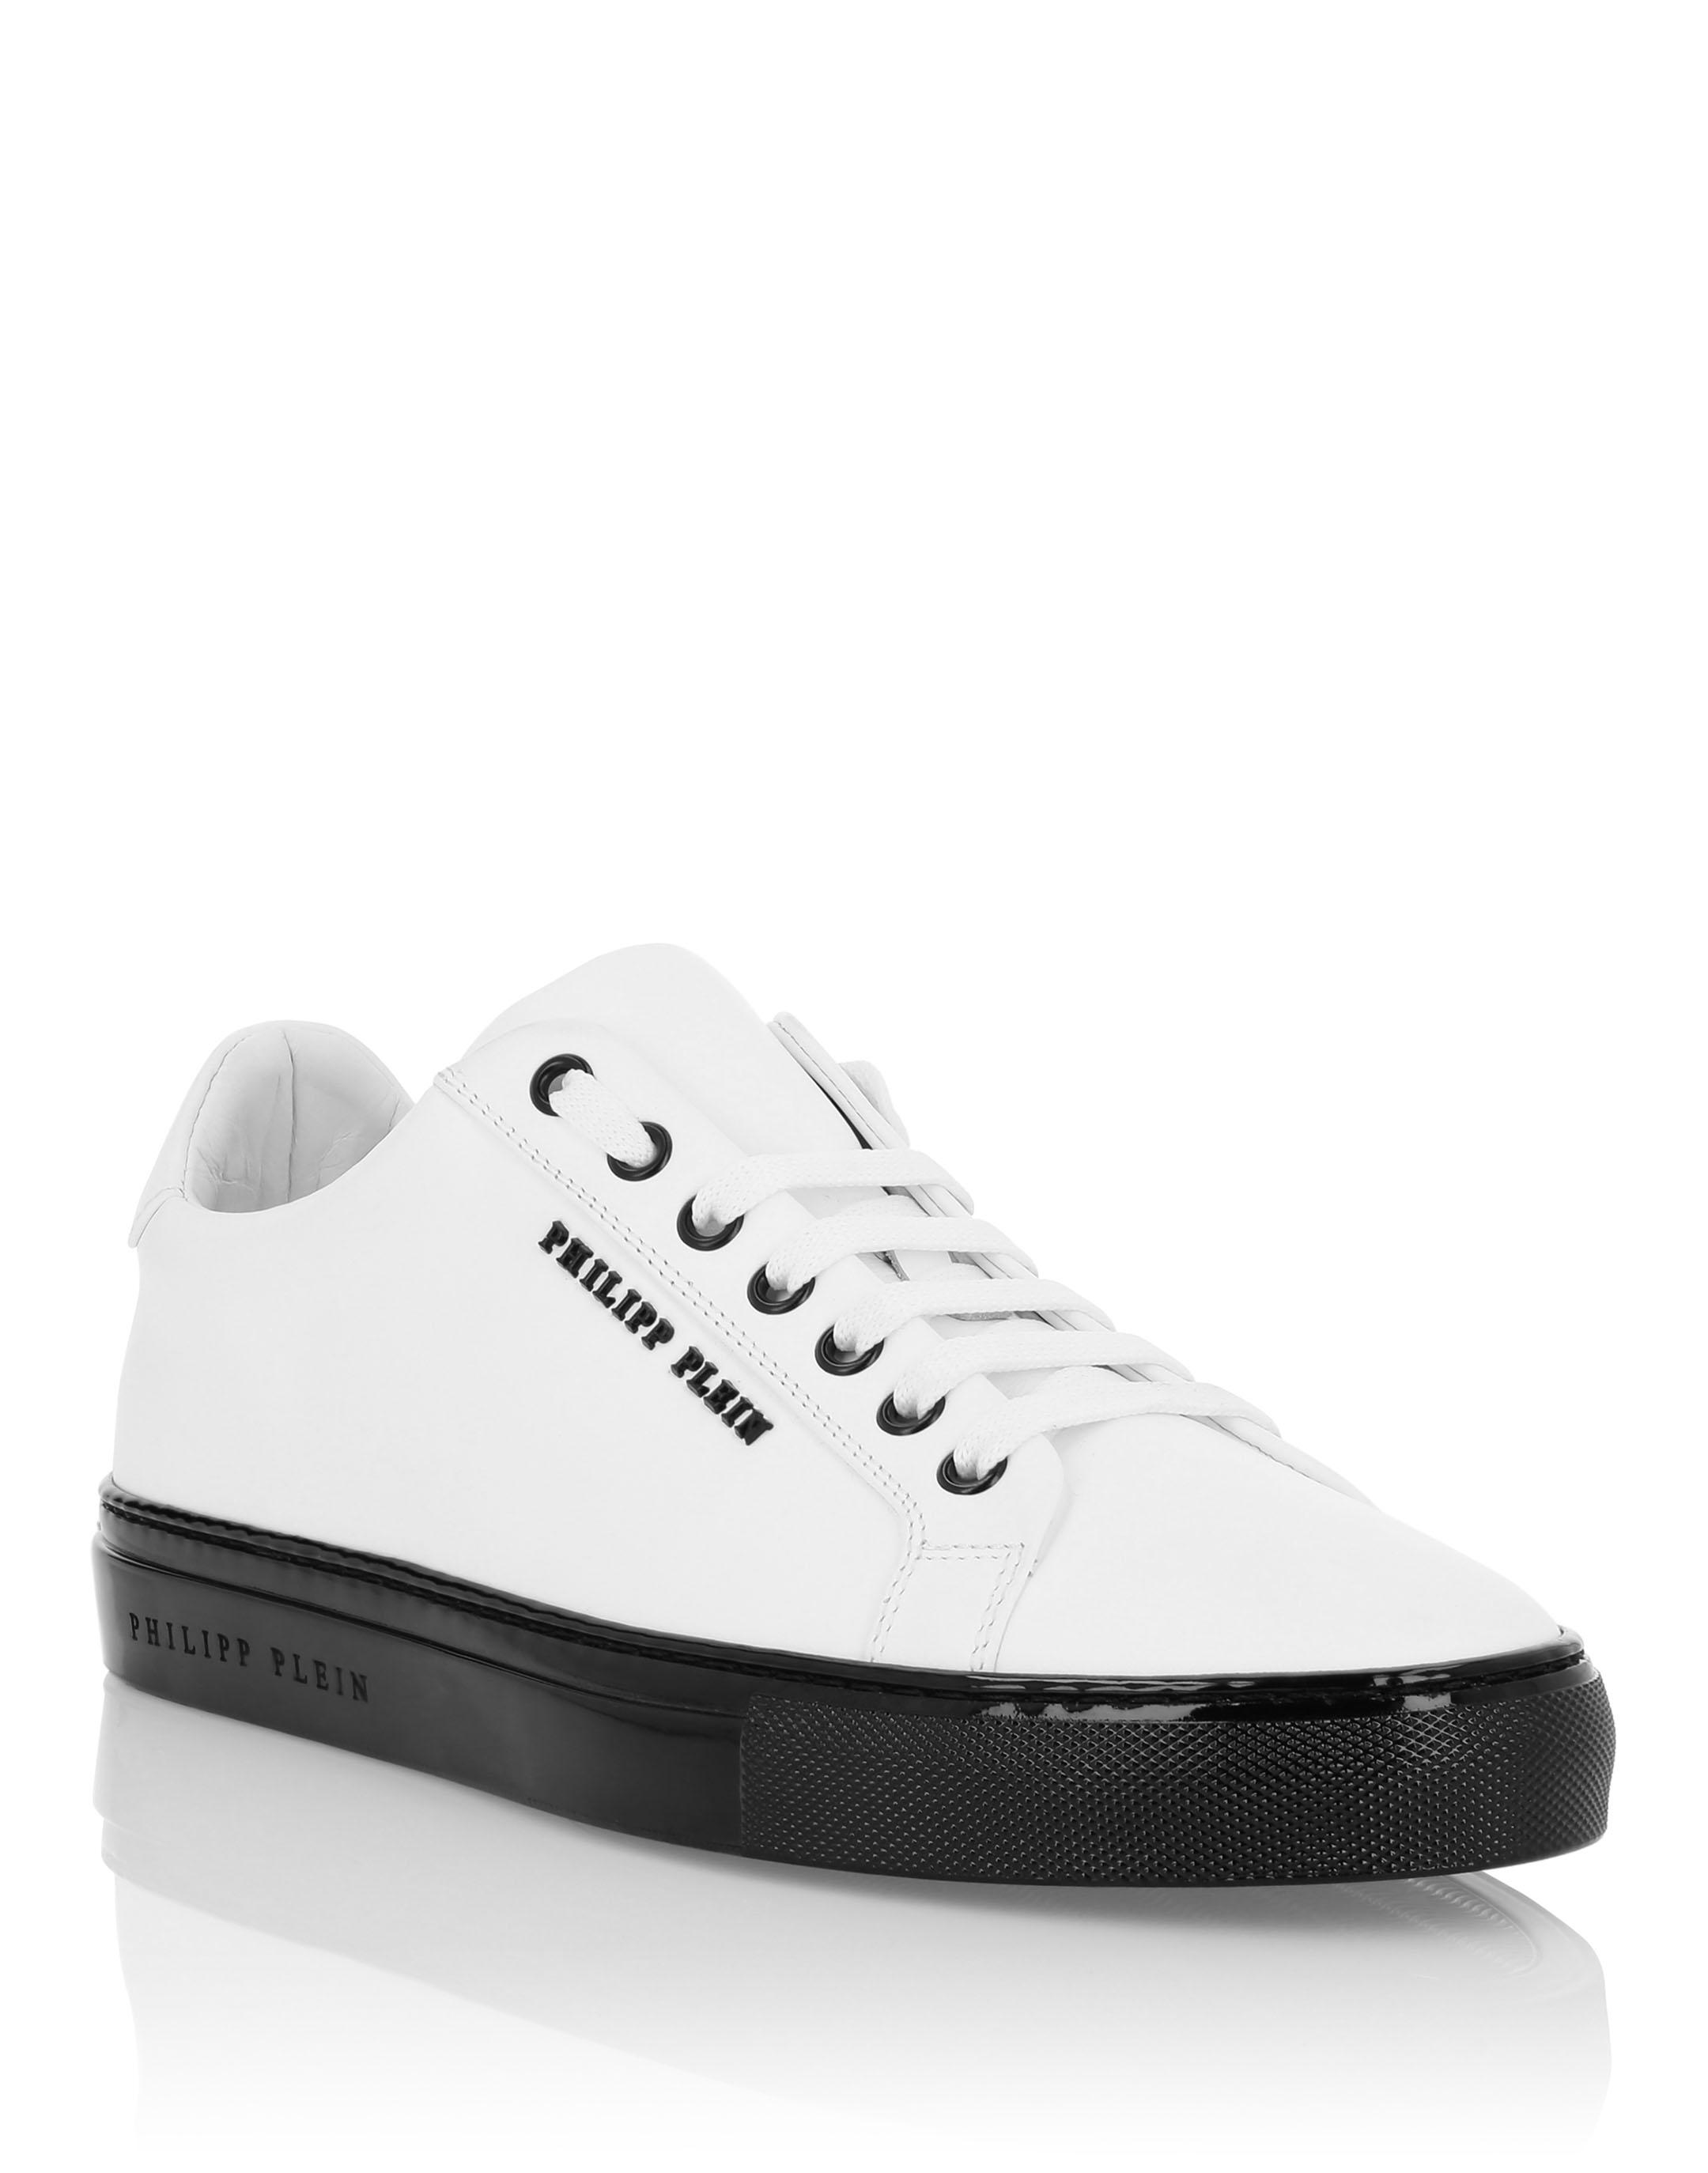 Sneakers Top StatementPhilipp Lo Top Lo Plein e29YWEDHI